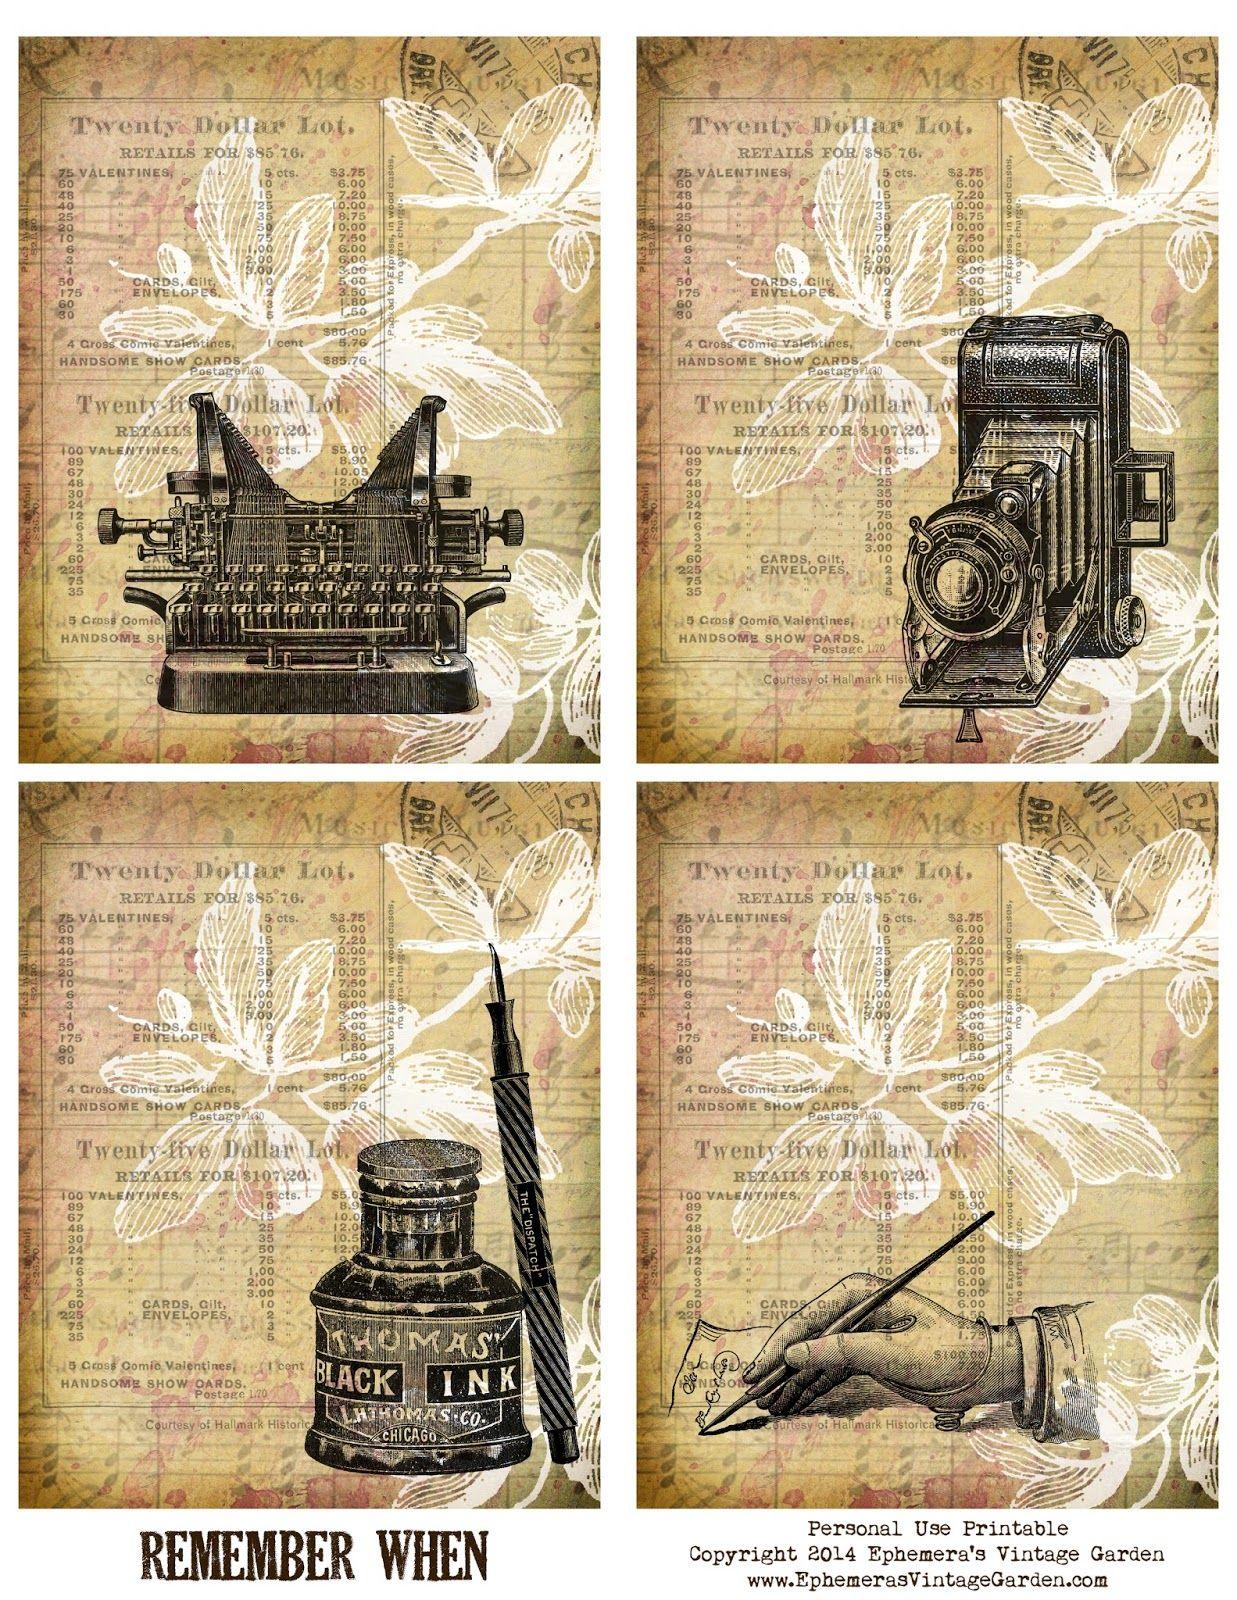 Ephemera 39 s vintage garden free printables papel deco - Papel vintage pared ...